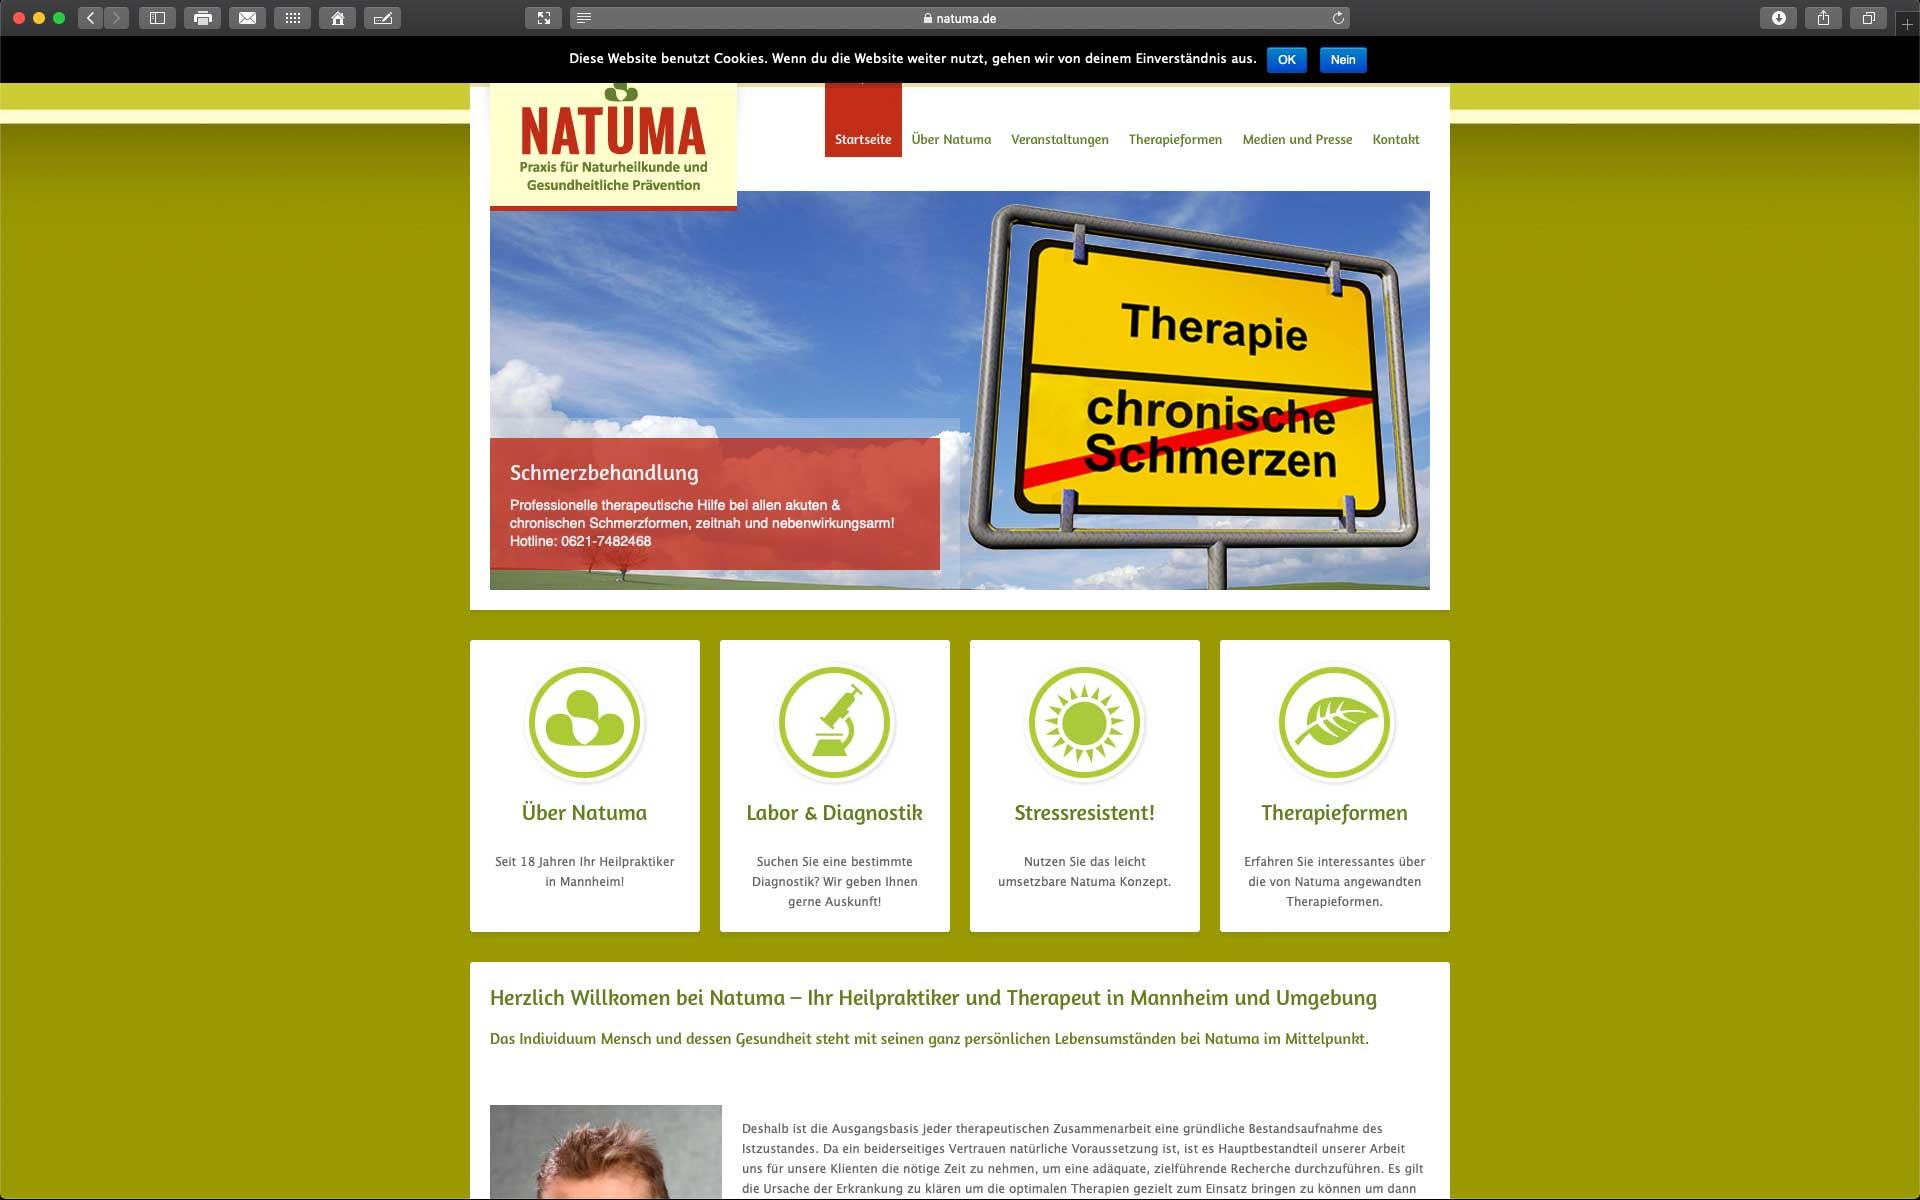 Foto: Website der Naturheilpraxis Natuma in Mannheim